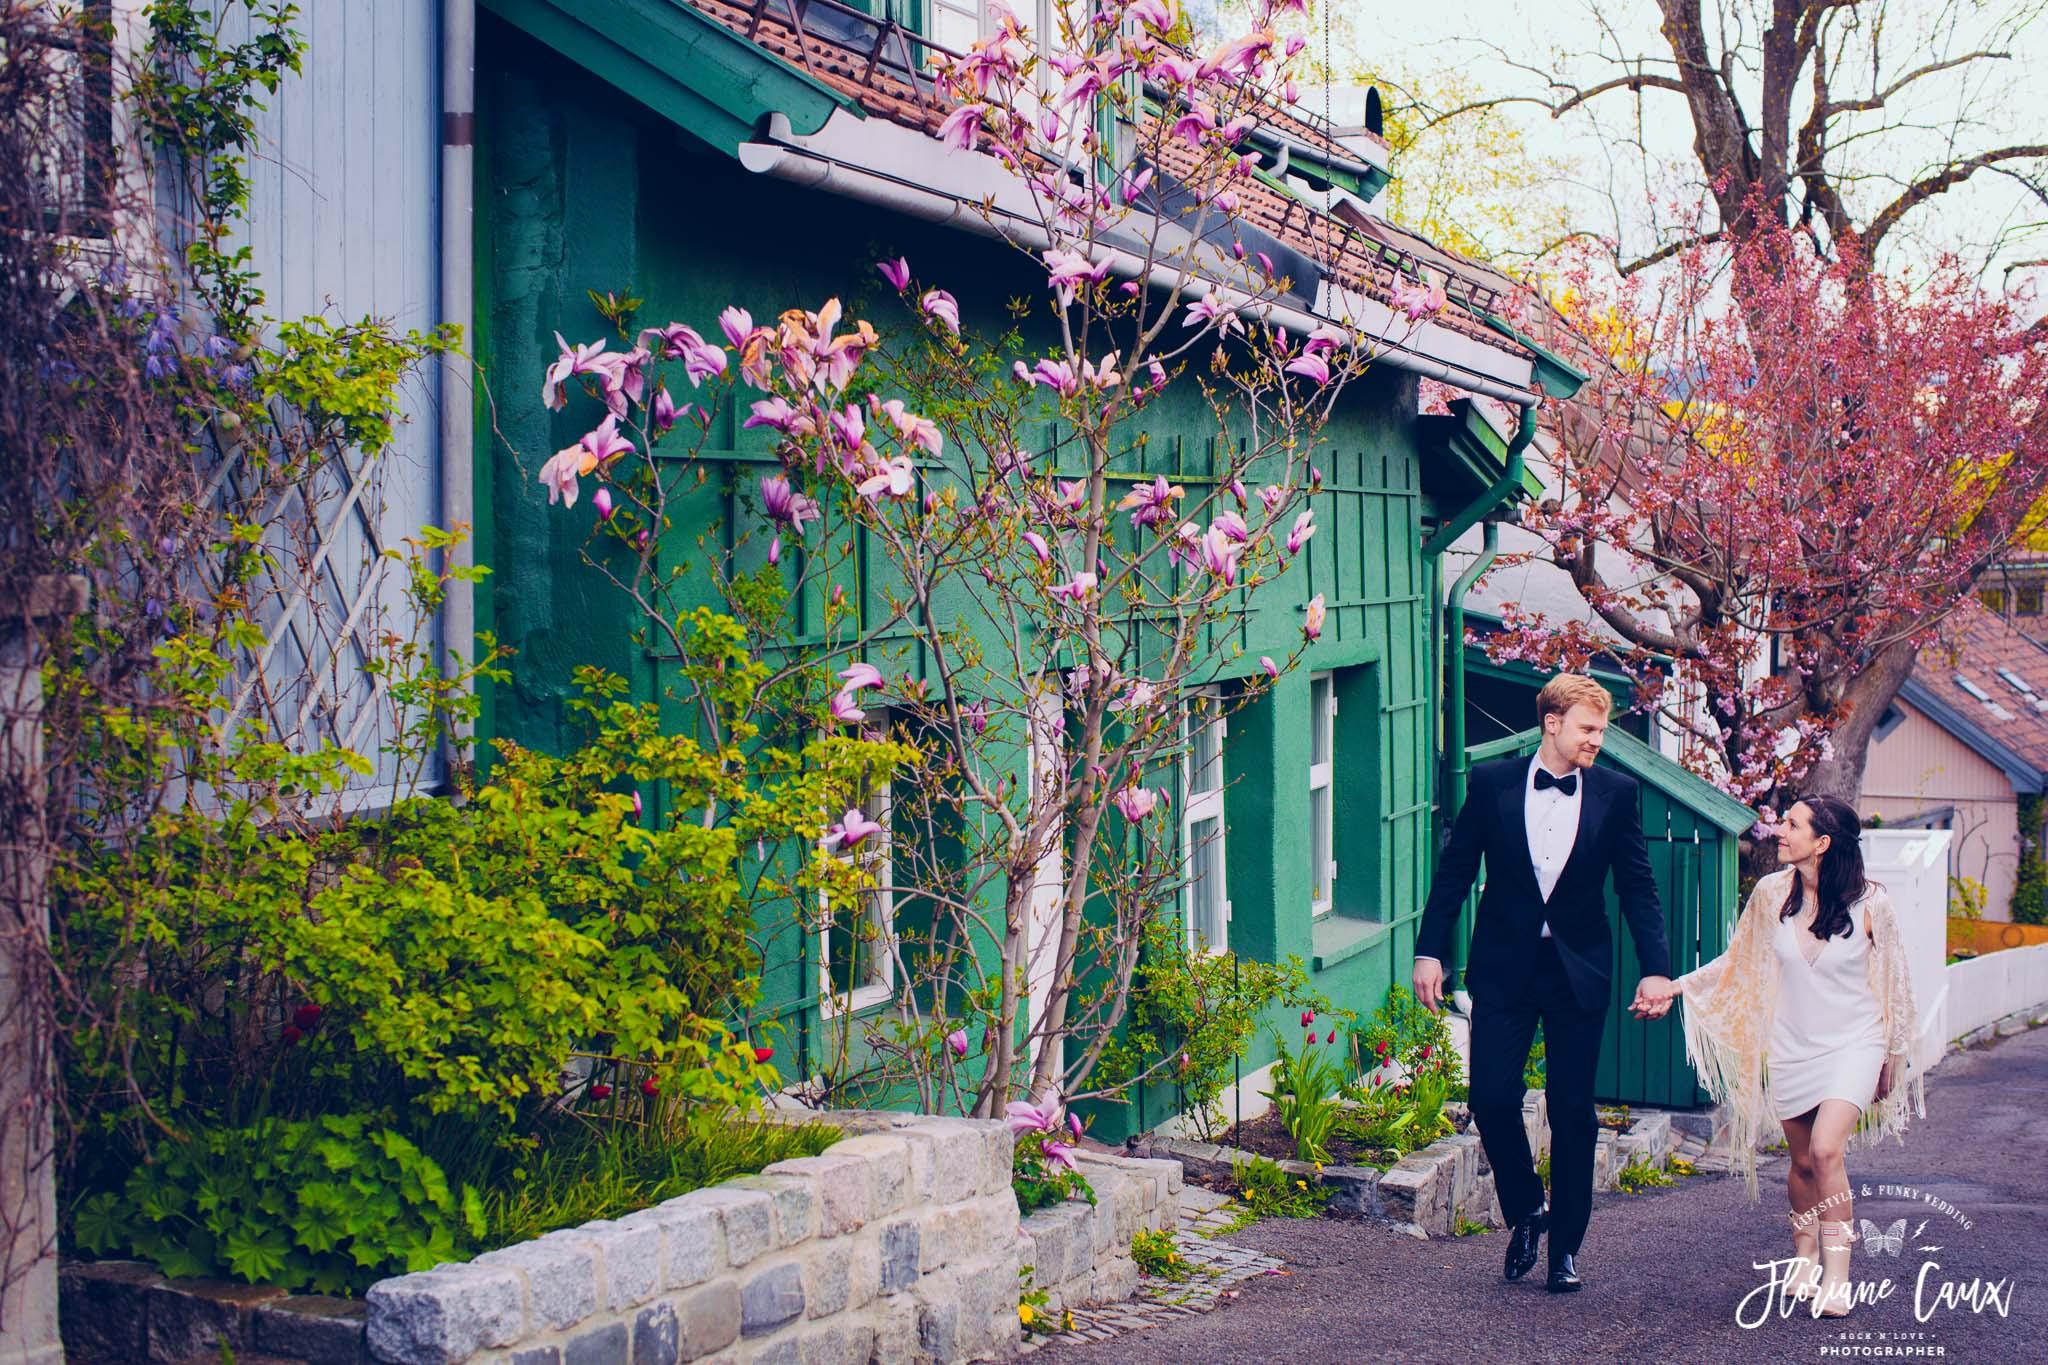 destination-wedding-photographer-oslo-norway-floriane-caux-11